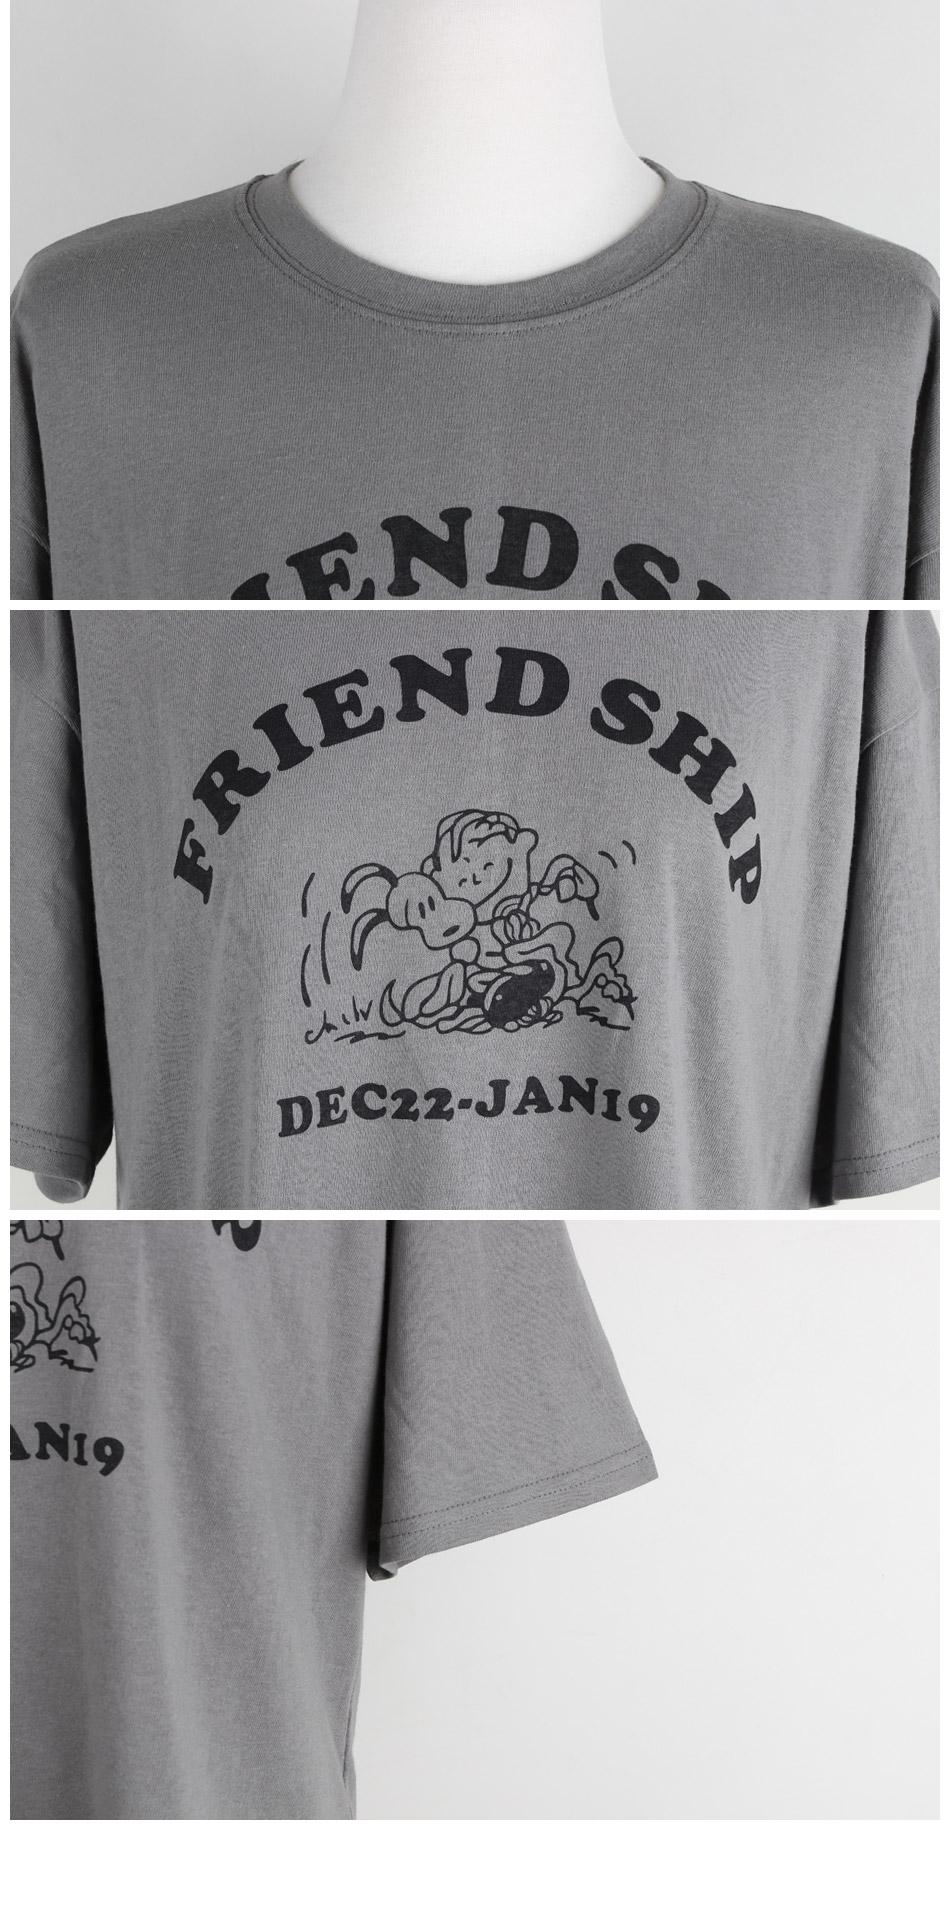 Friend lettering short sleeve tee